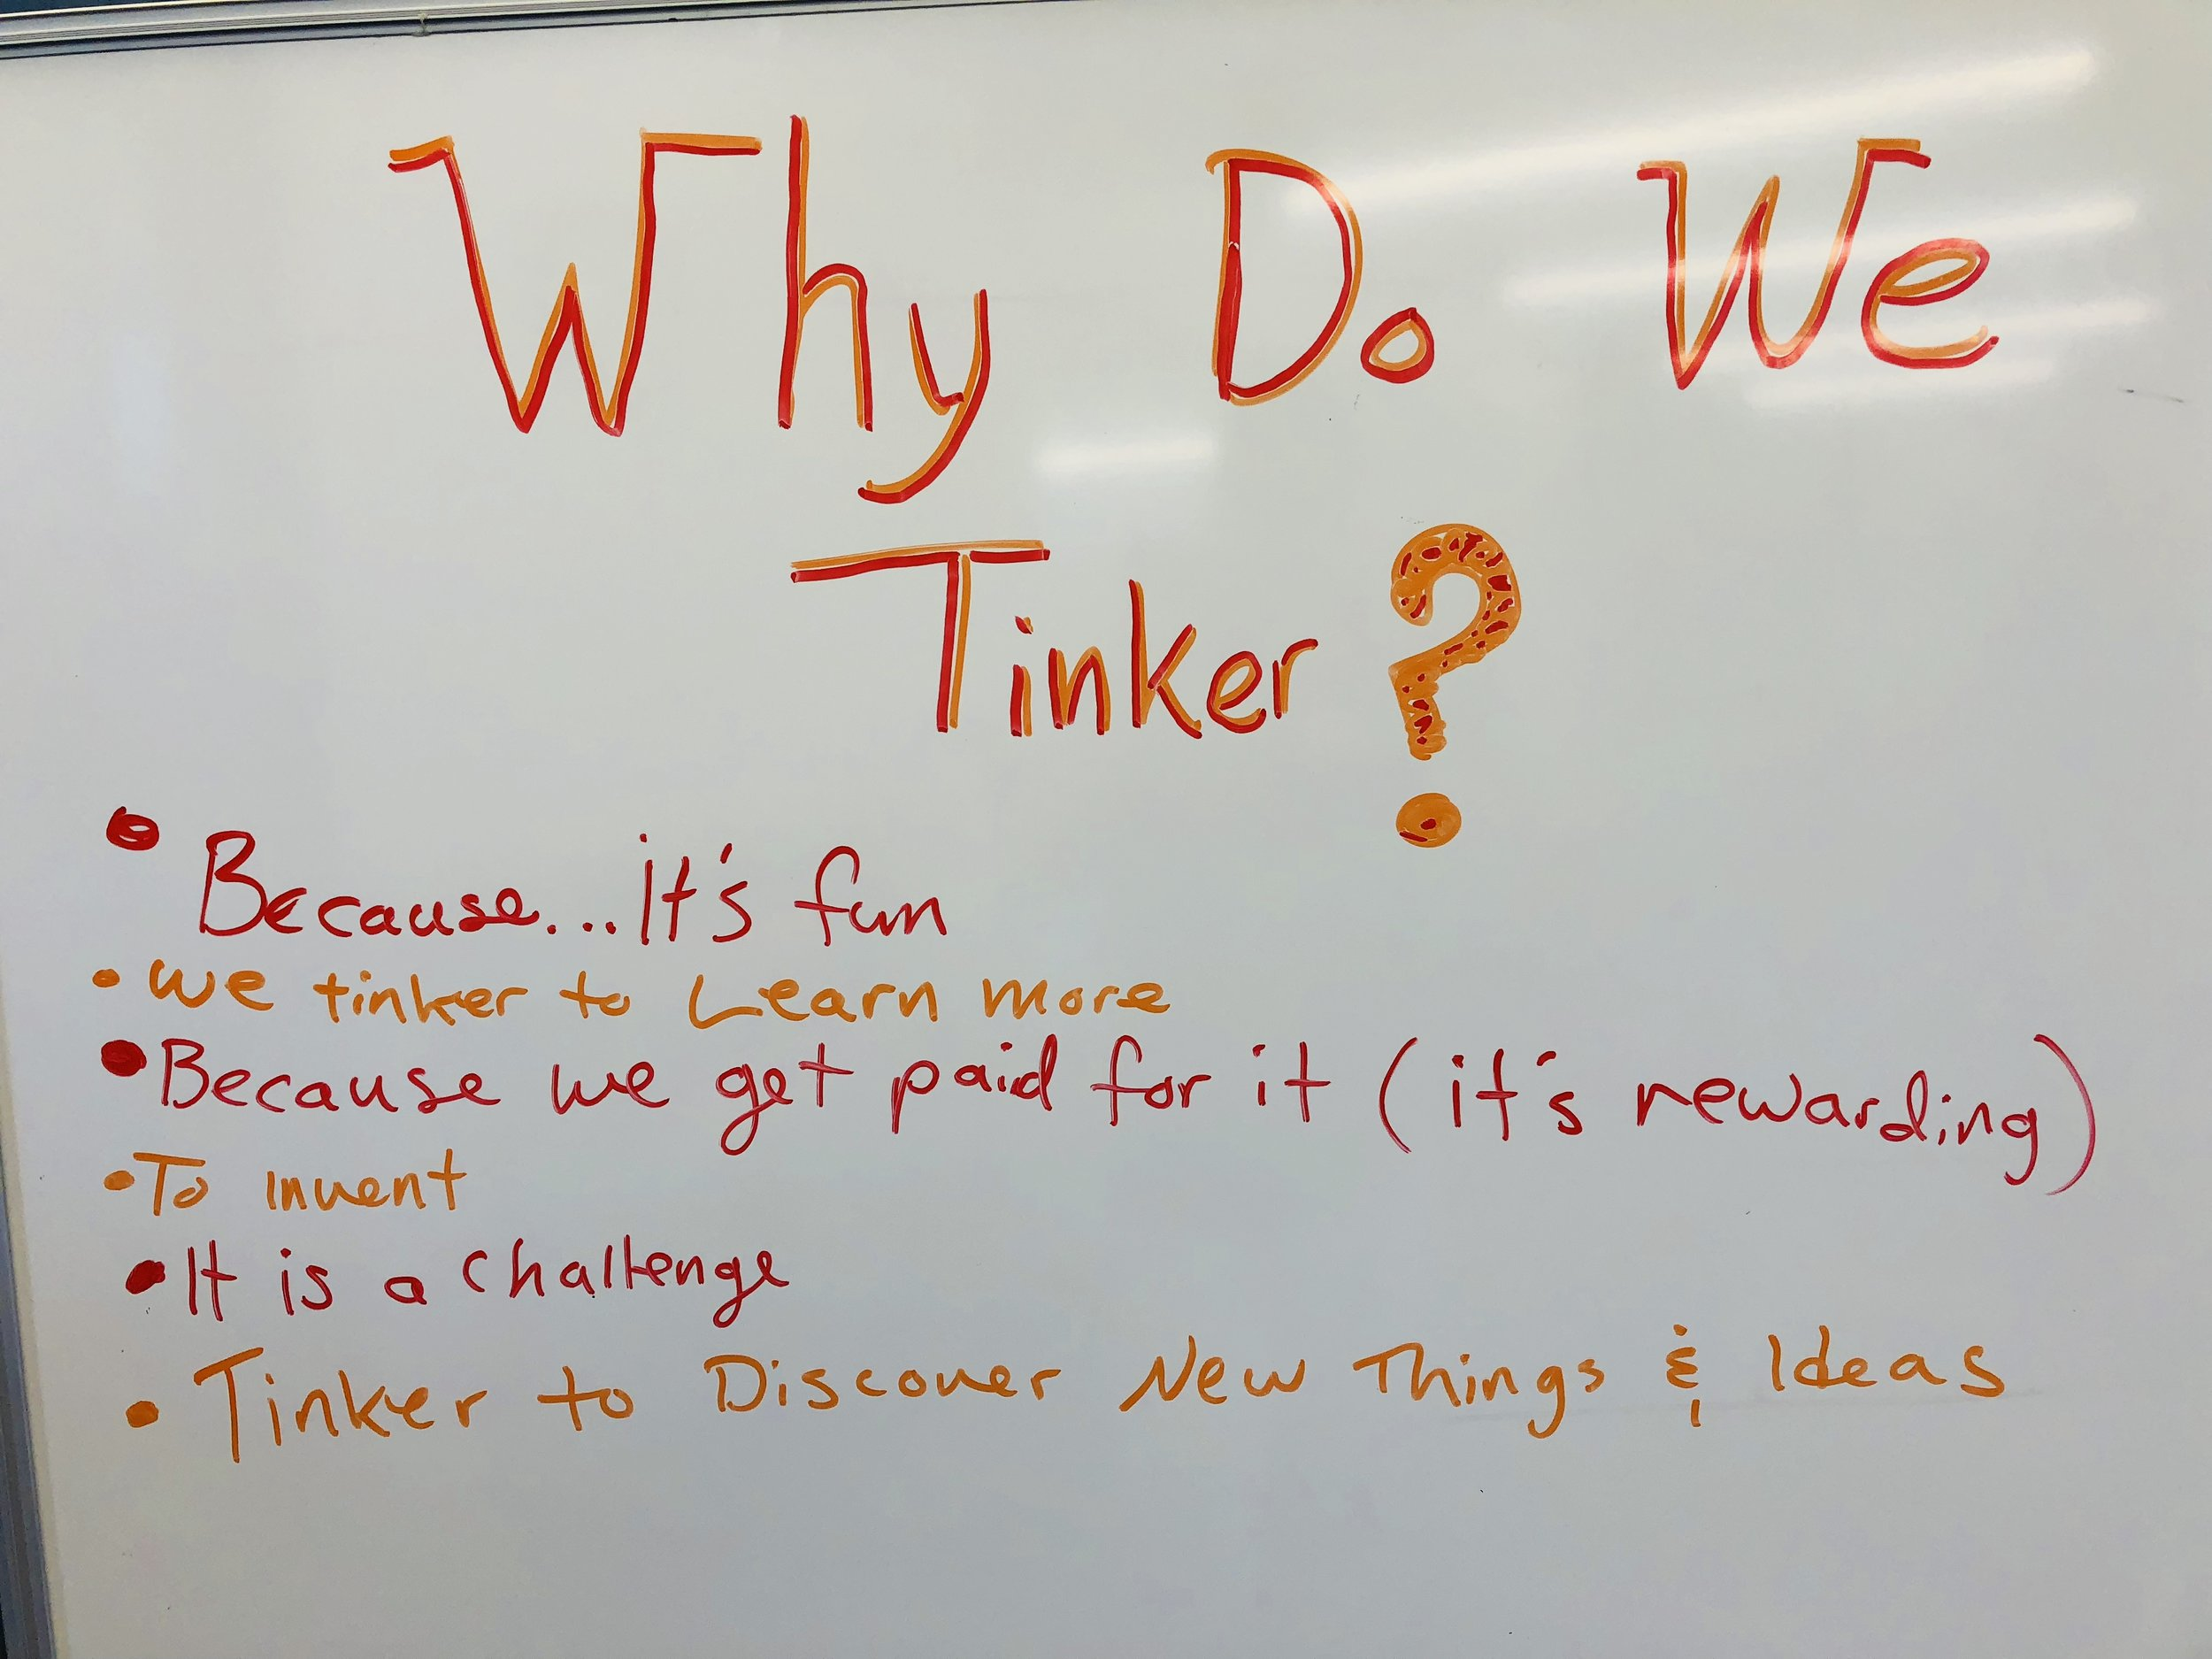 Our group summary